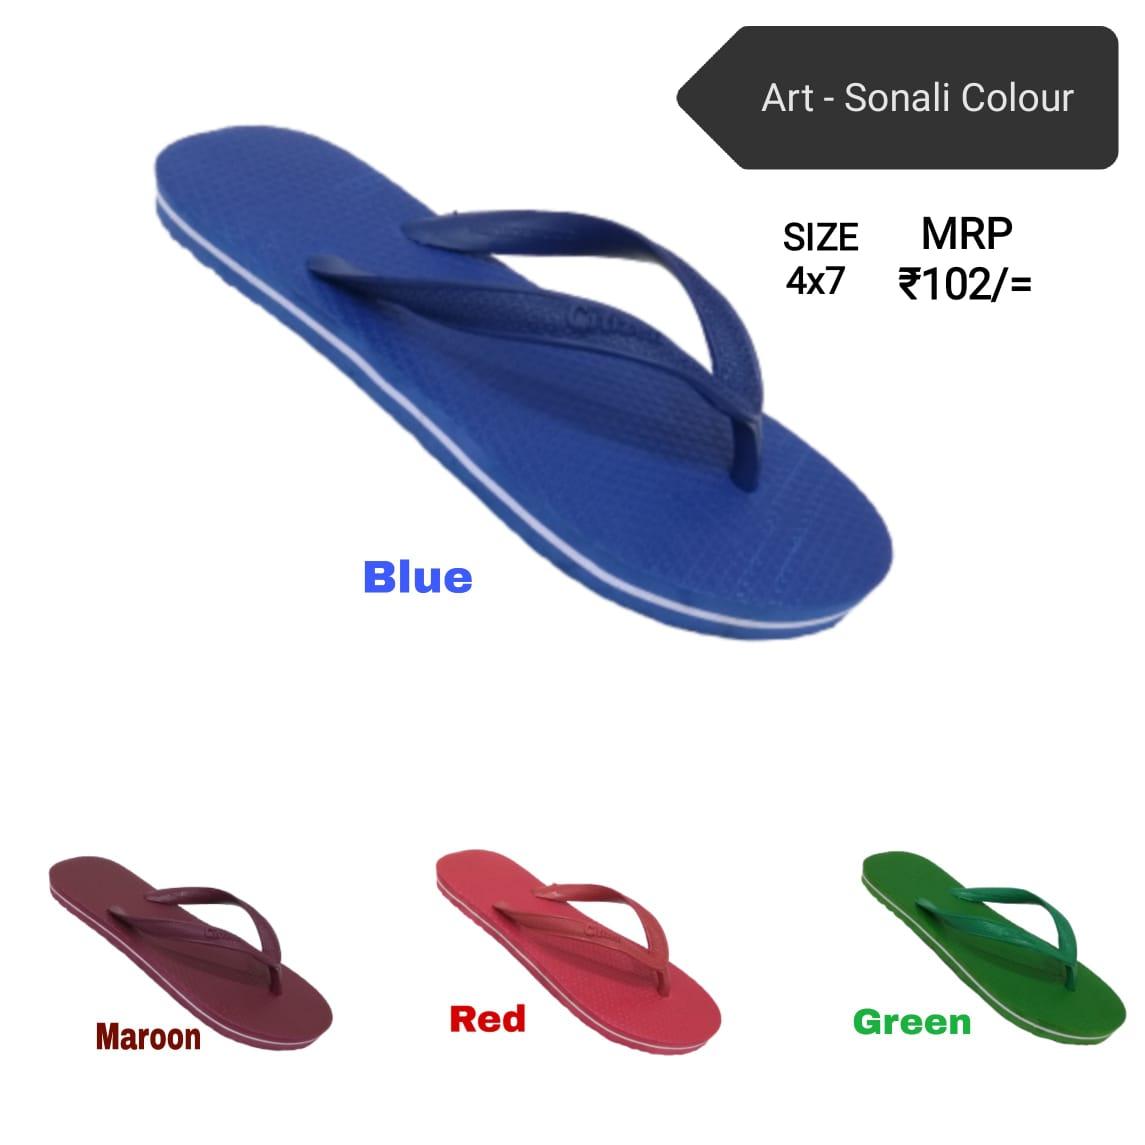 Citizen ladies hawai - sonali / colour ,flip flops , slippers